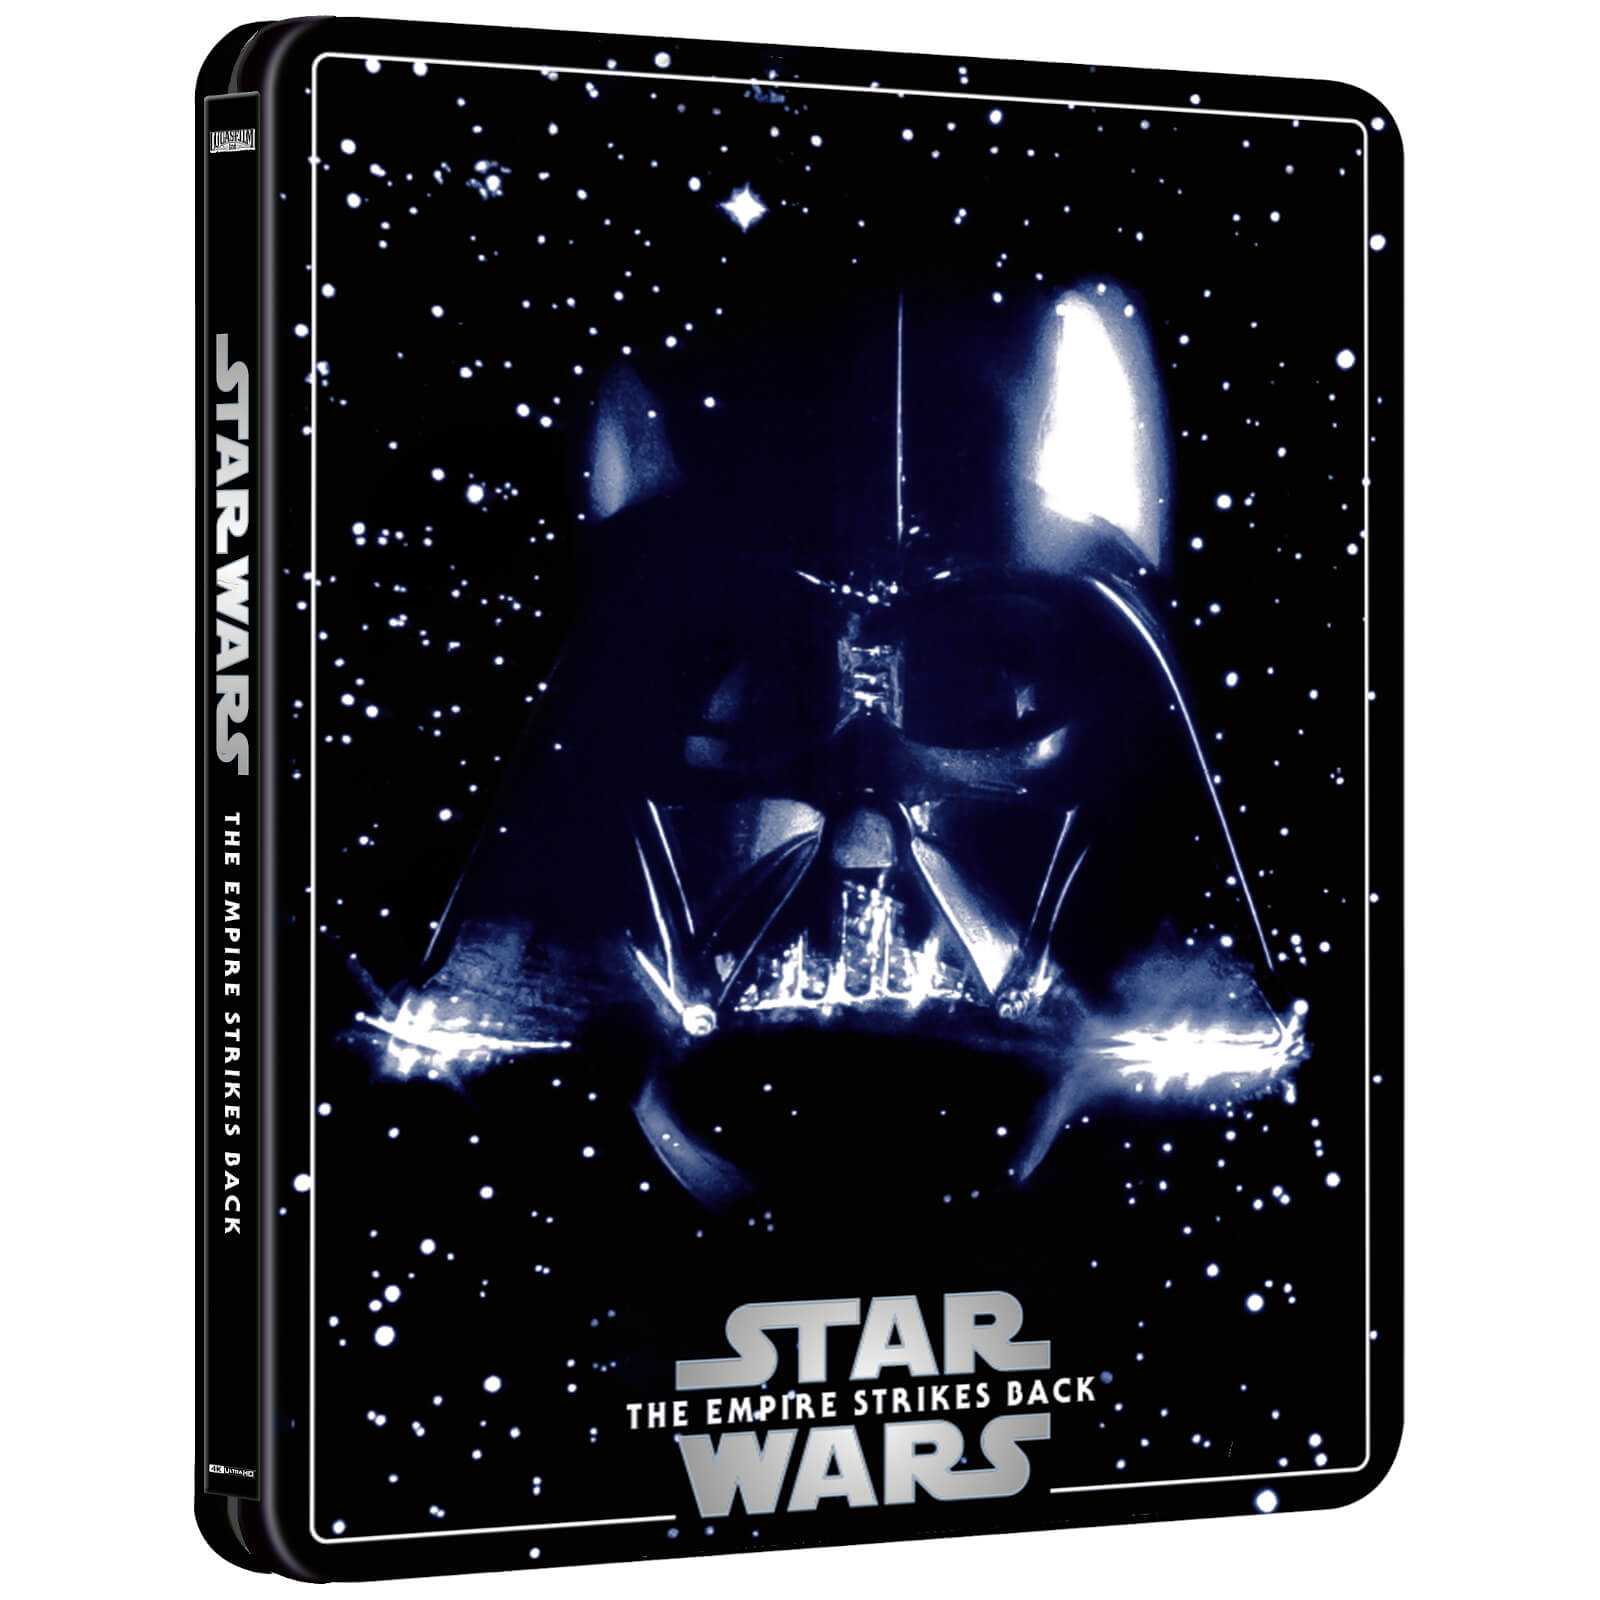 Star Wars: Episode V - The Empire Strikes Back (4K+2D Blu-ray SteelBook) Zavvi Star-Wars-The-Empire-Strike-Back-steelbook-4K-zavvi-1-1